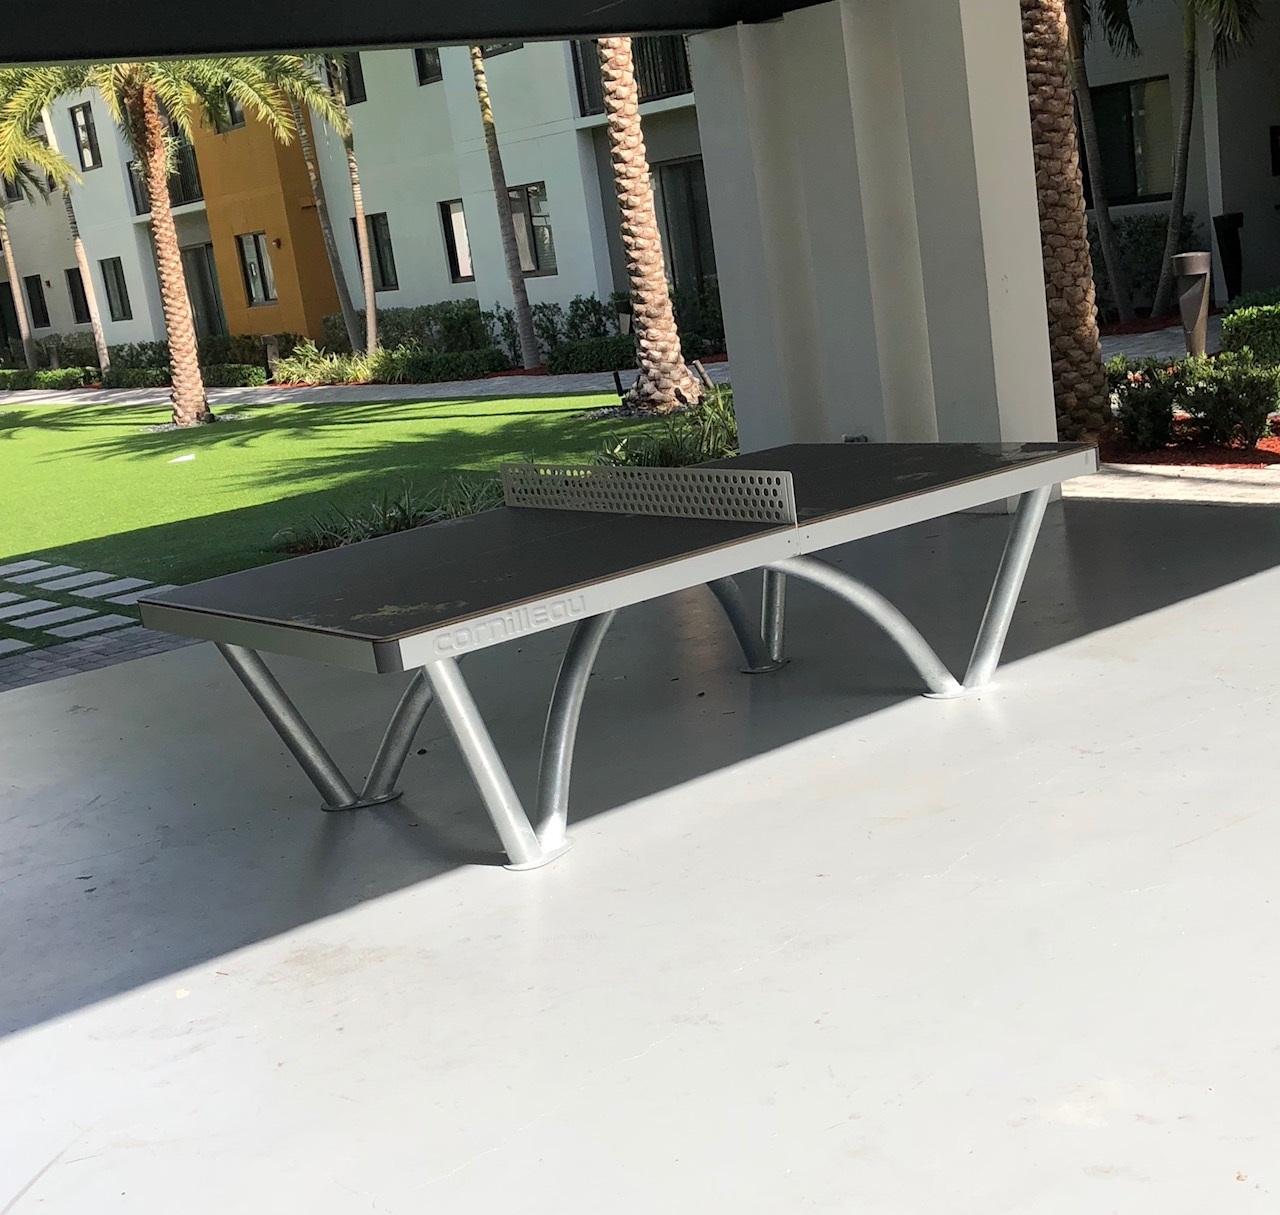 university park apartments florida ping pong table